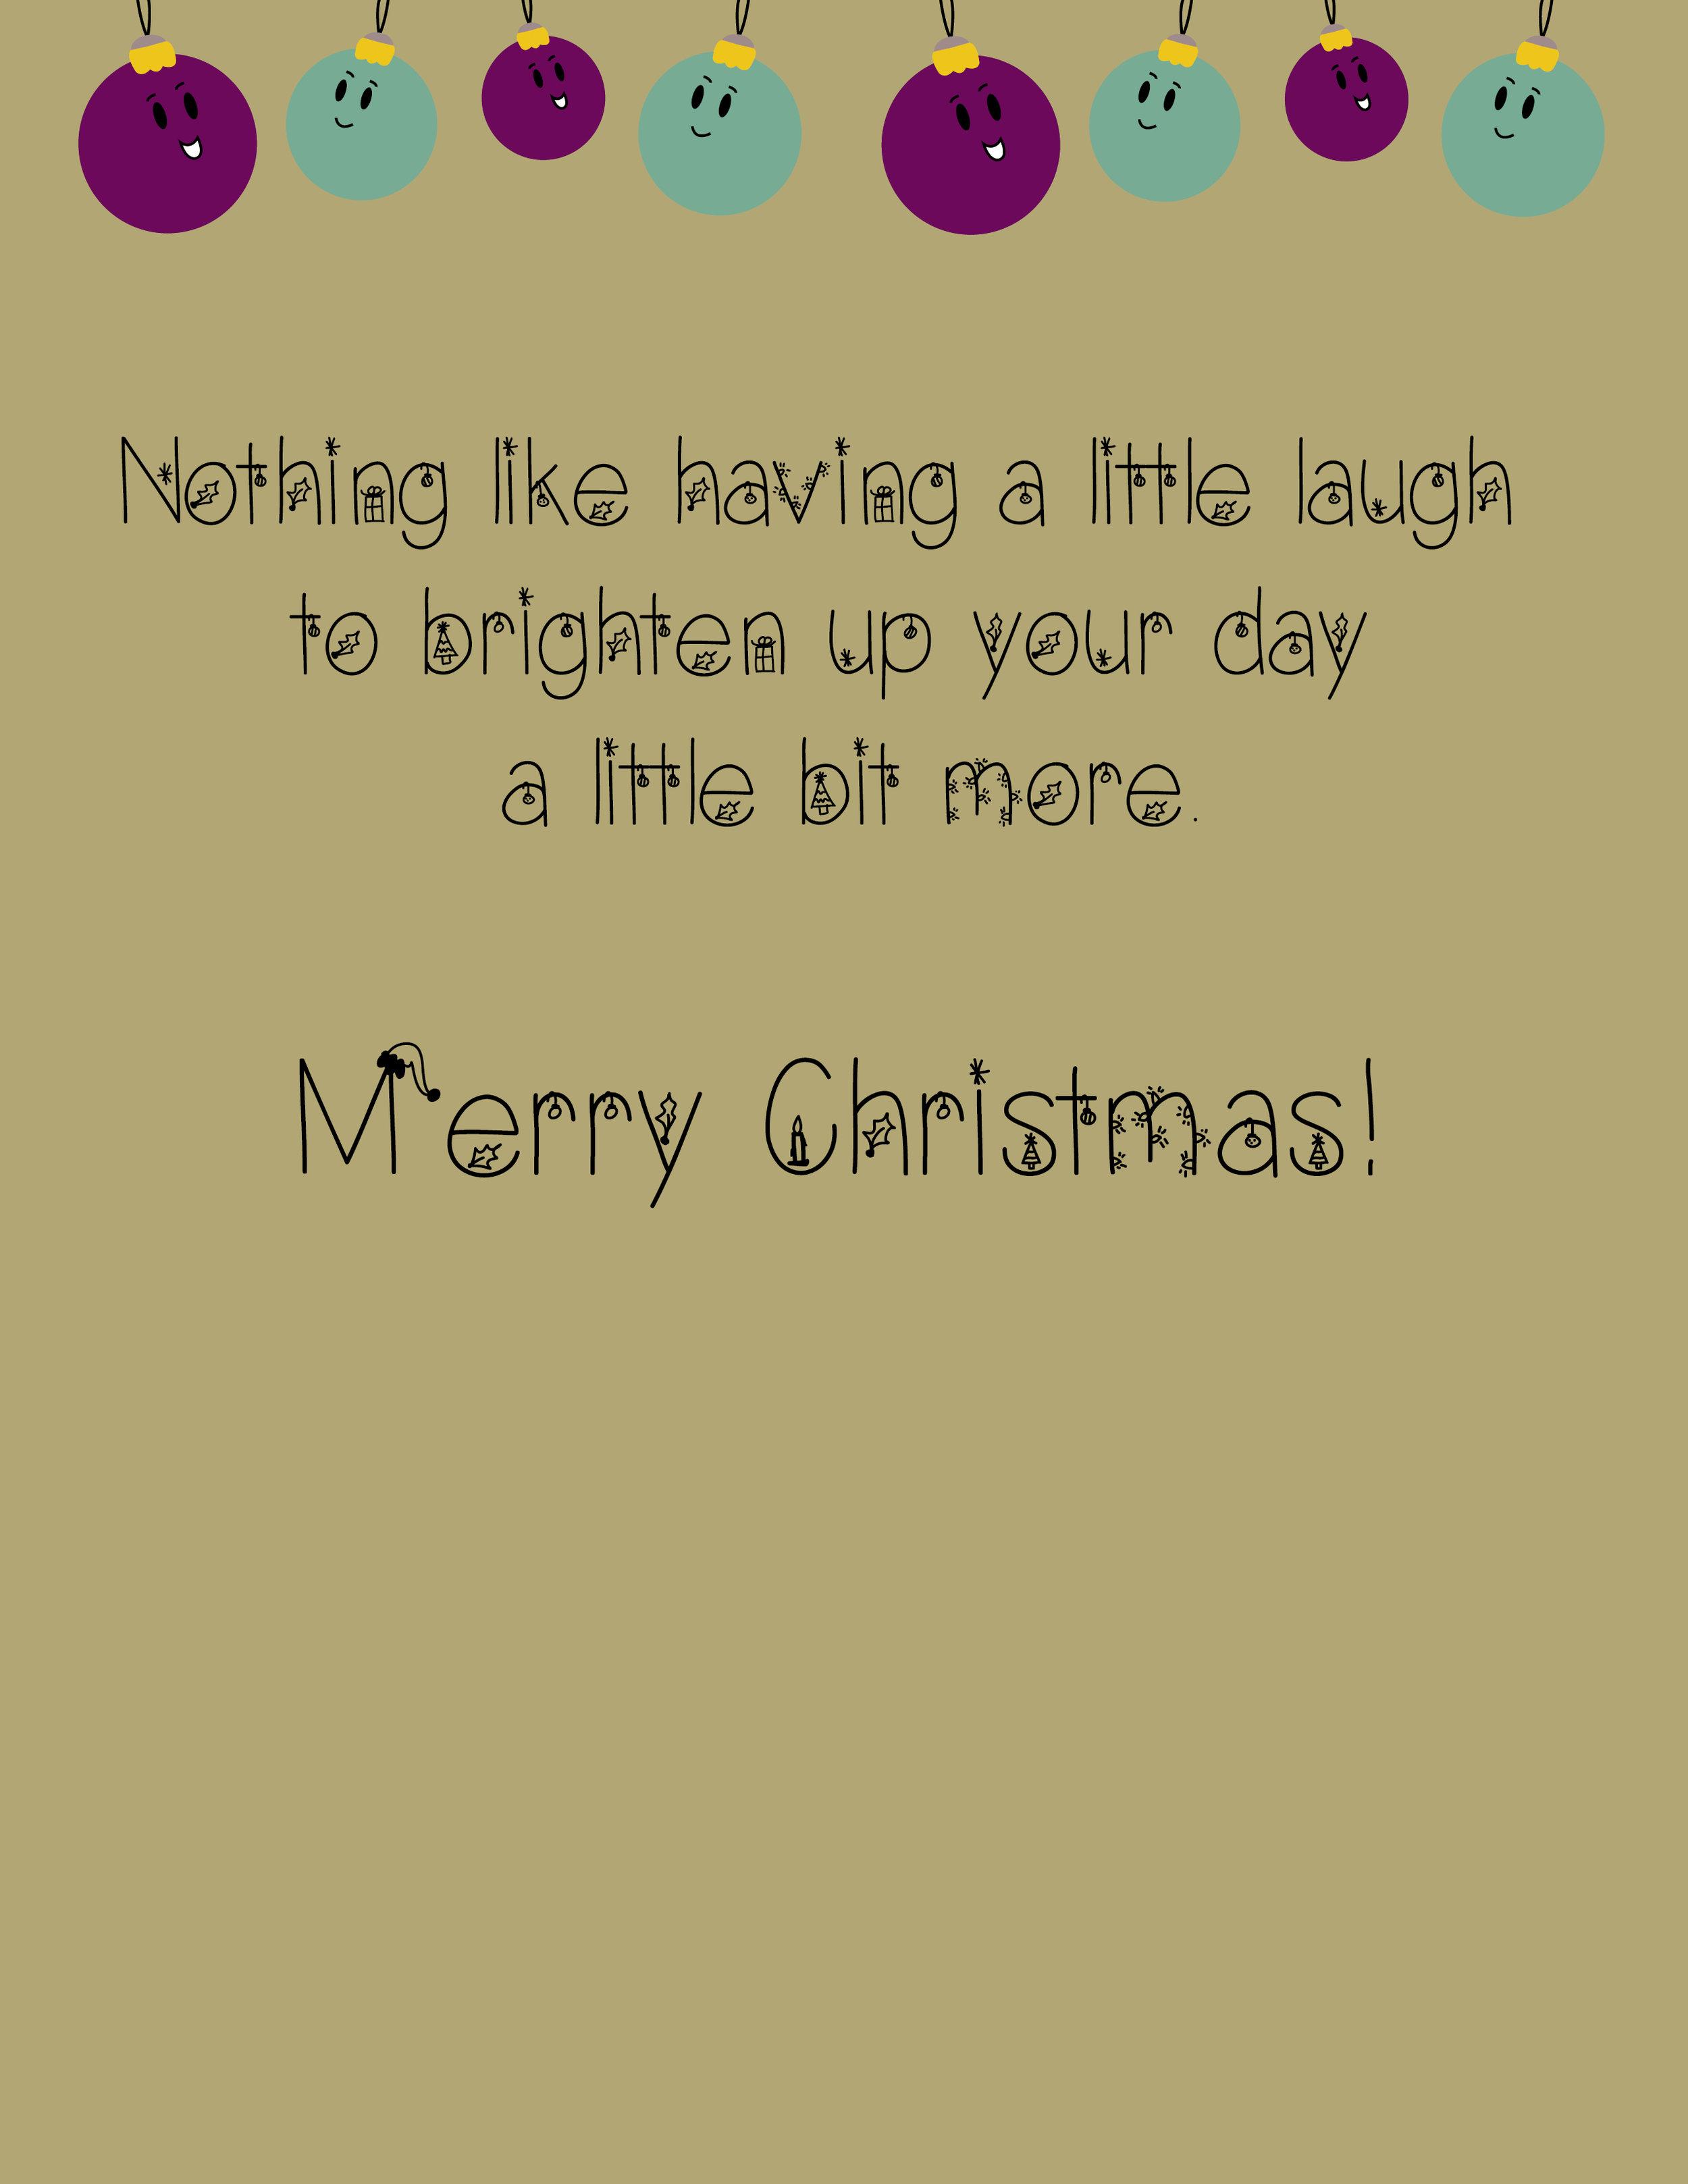 Christmas Card-Miranda3.jpg